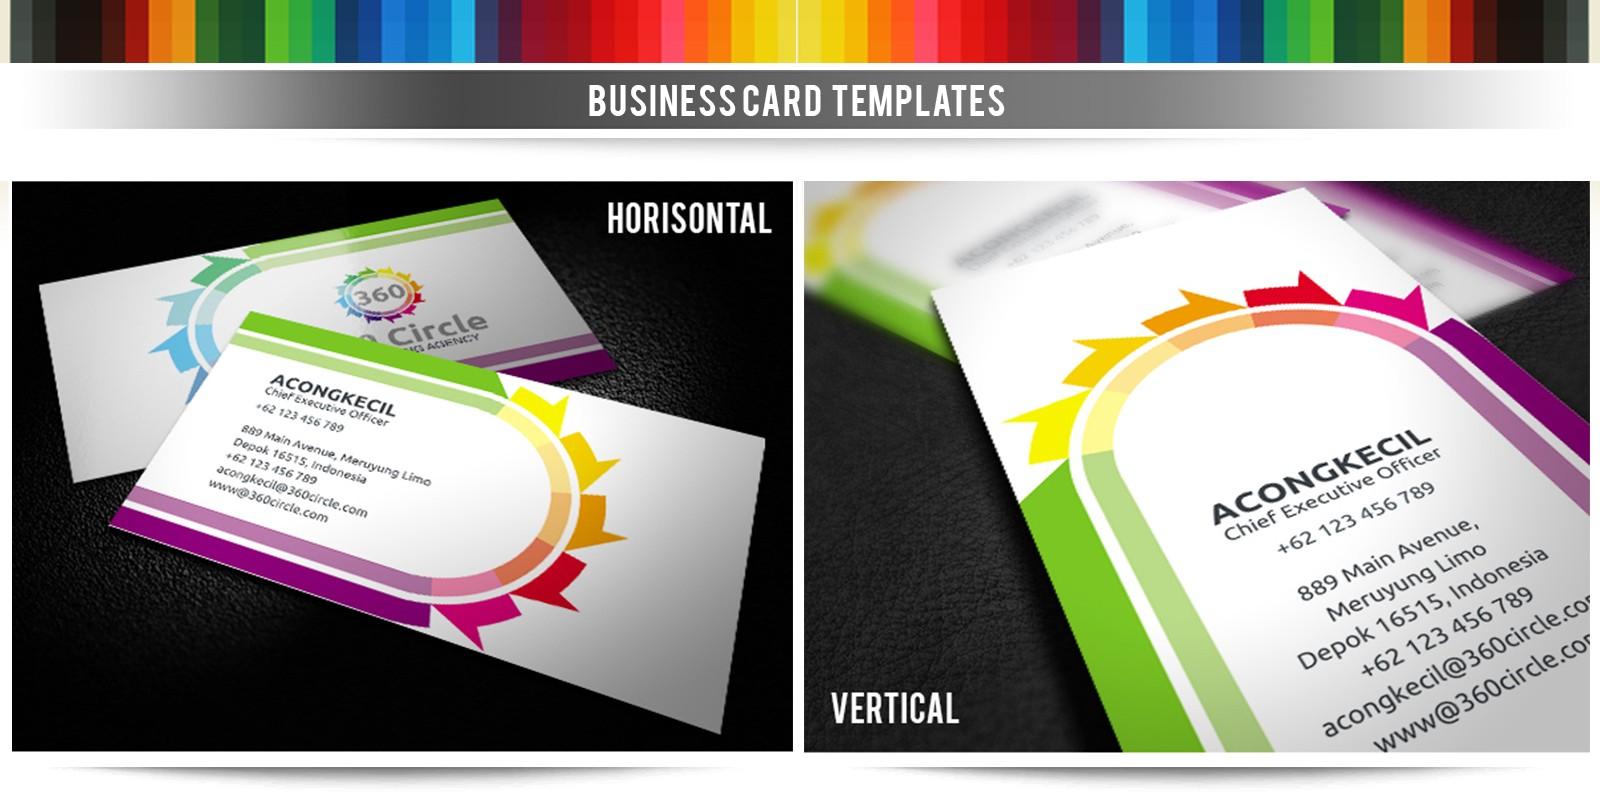 360 Circle - Premium Business Card Template